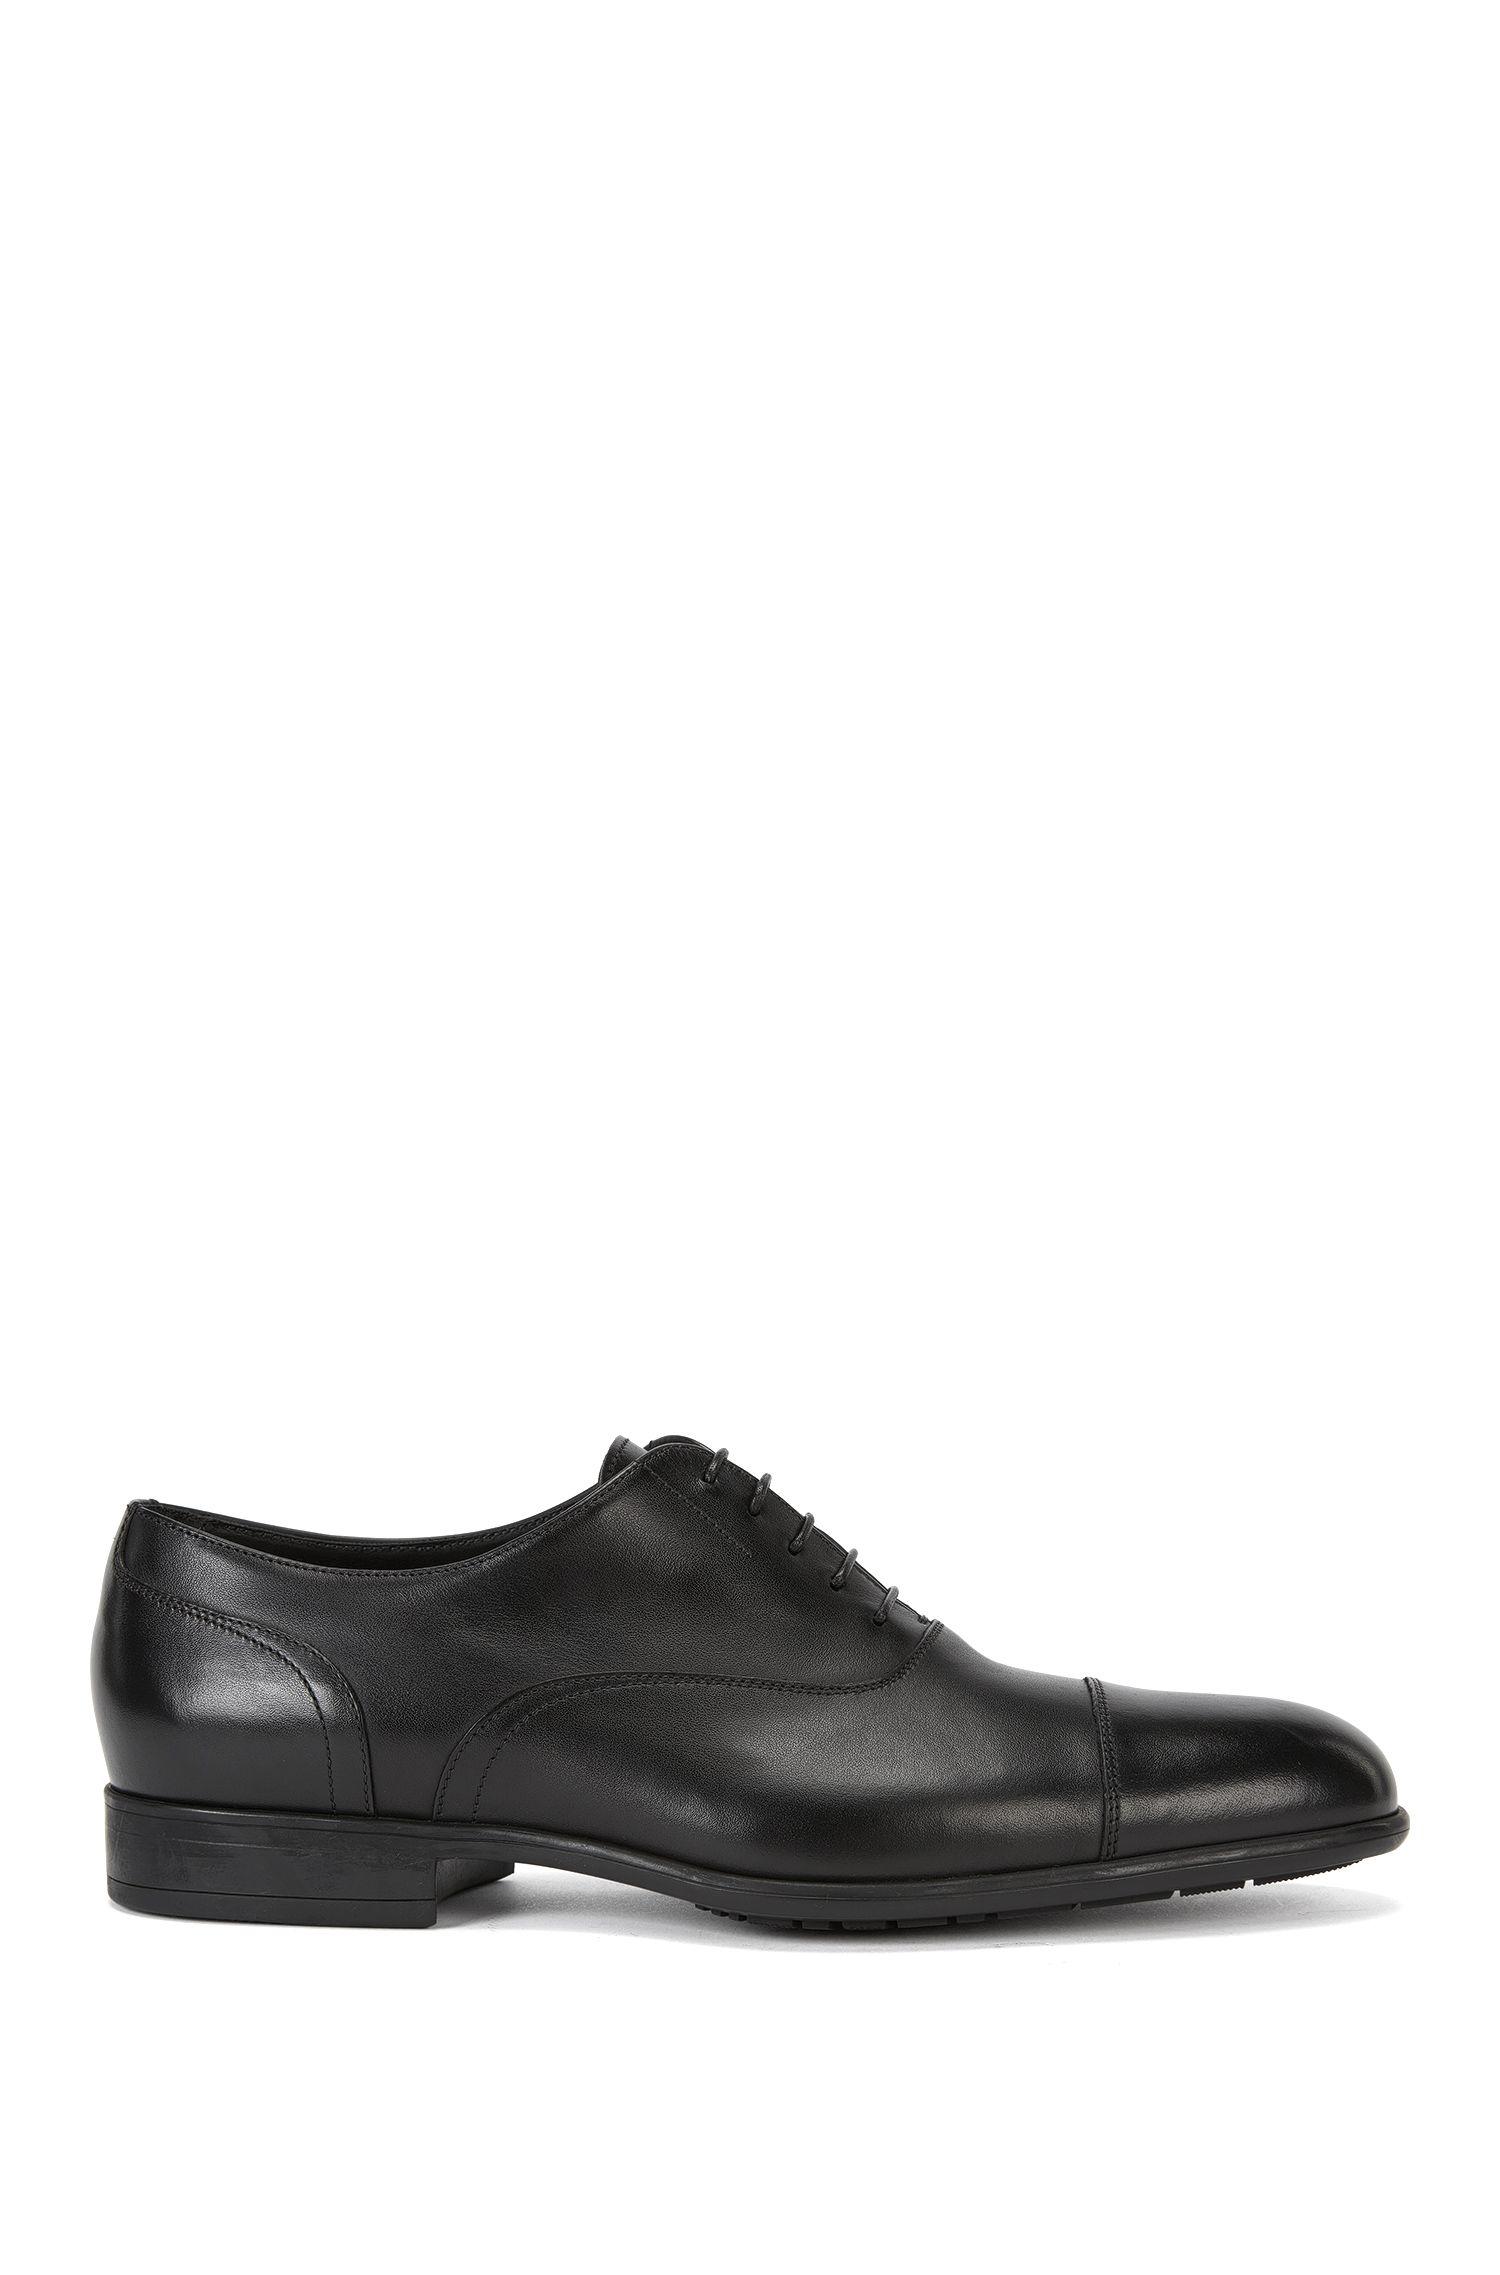 Scarpe stringate in pelle in stile Oxford: 'Gentleman_Oxfr_ct'